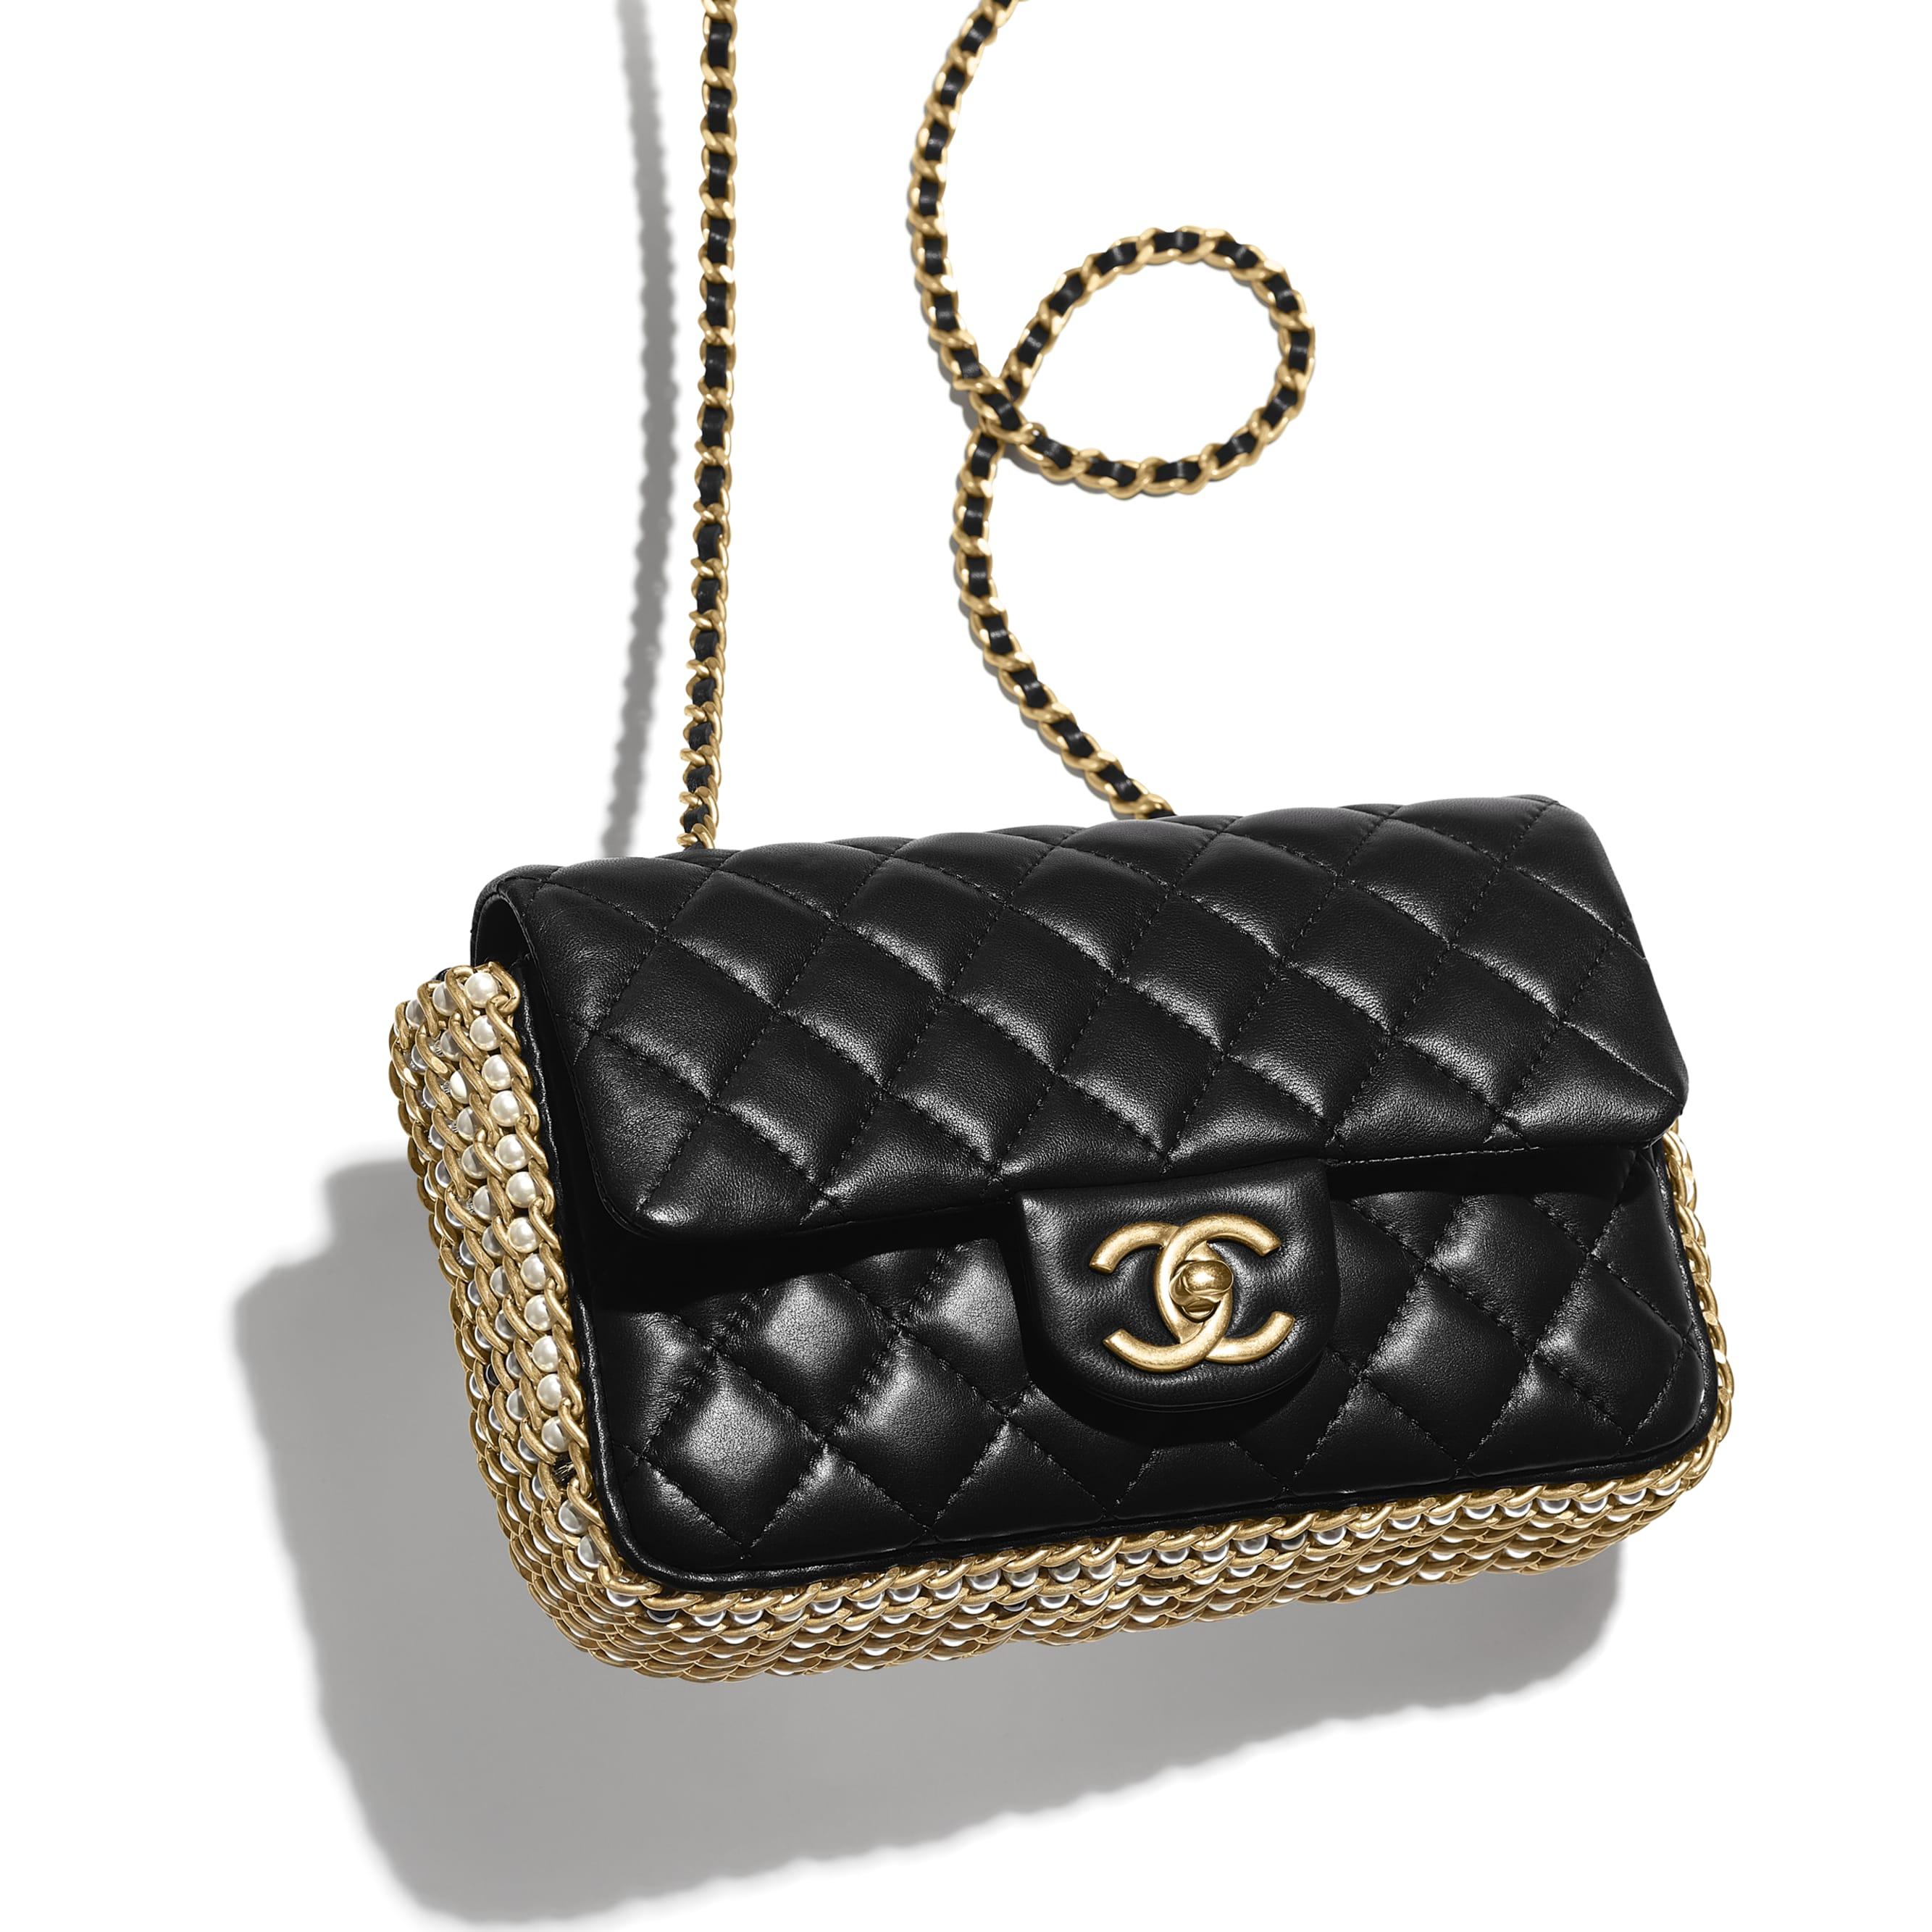 Flap Bag - Black - Lambskin, Imitation Pearls & Gold Metal - Extra view - see standard sized version